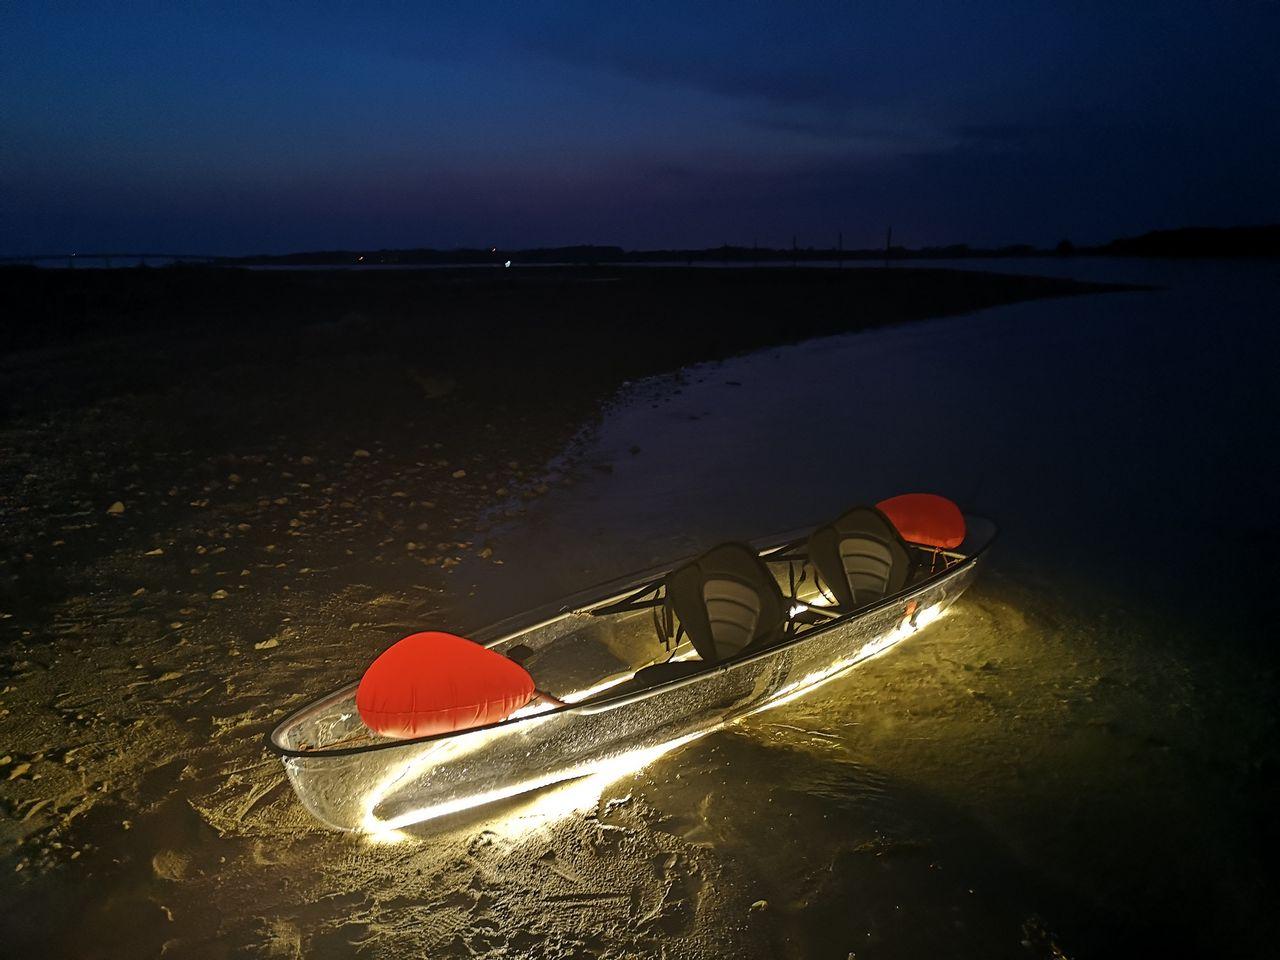 transparent kayak on the sea by nighr